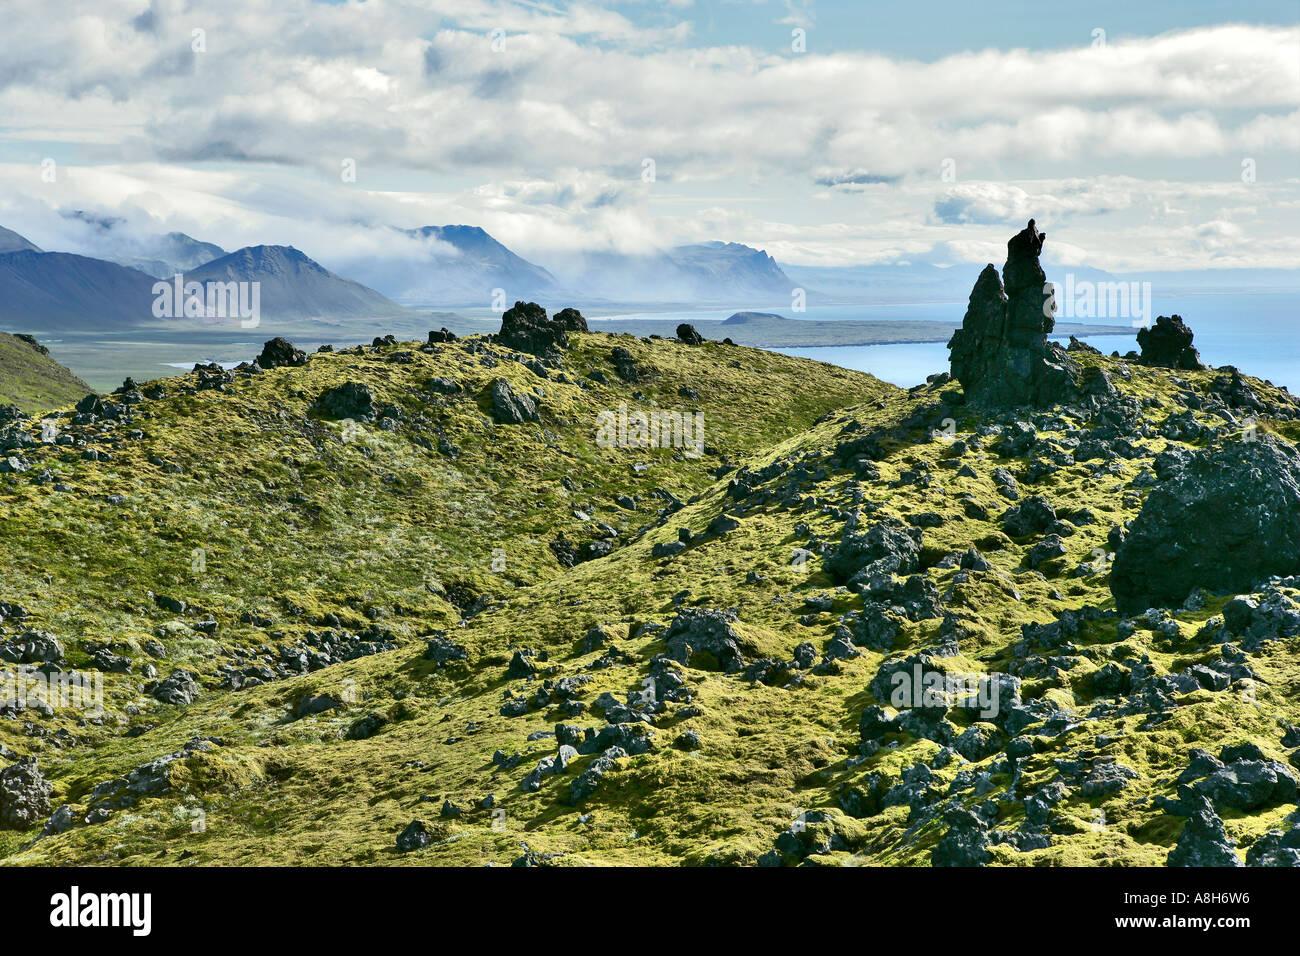 La côte montagneuse Islande Snæfellsnes Photo Stock